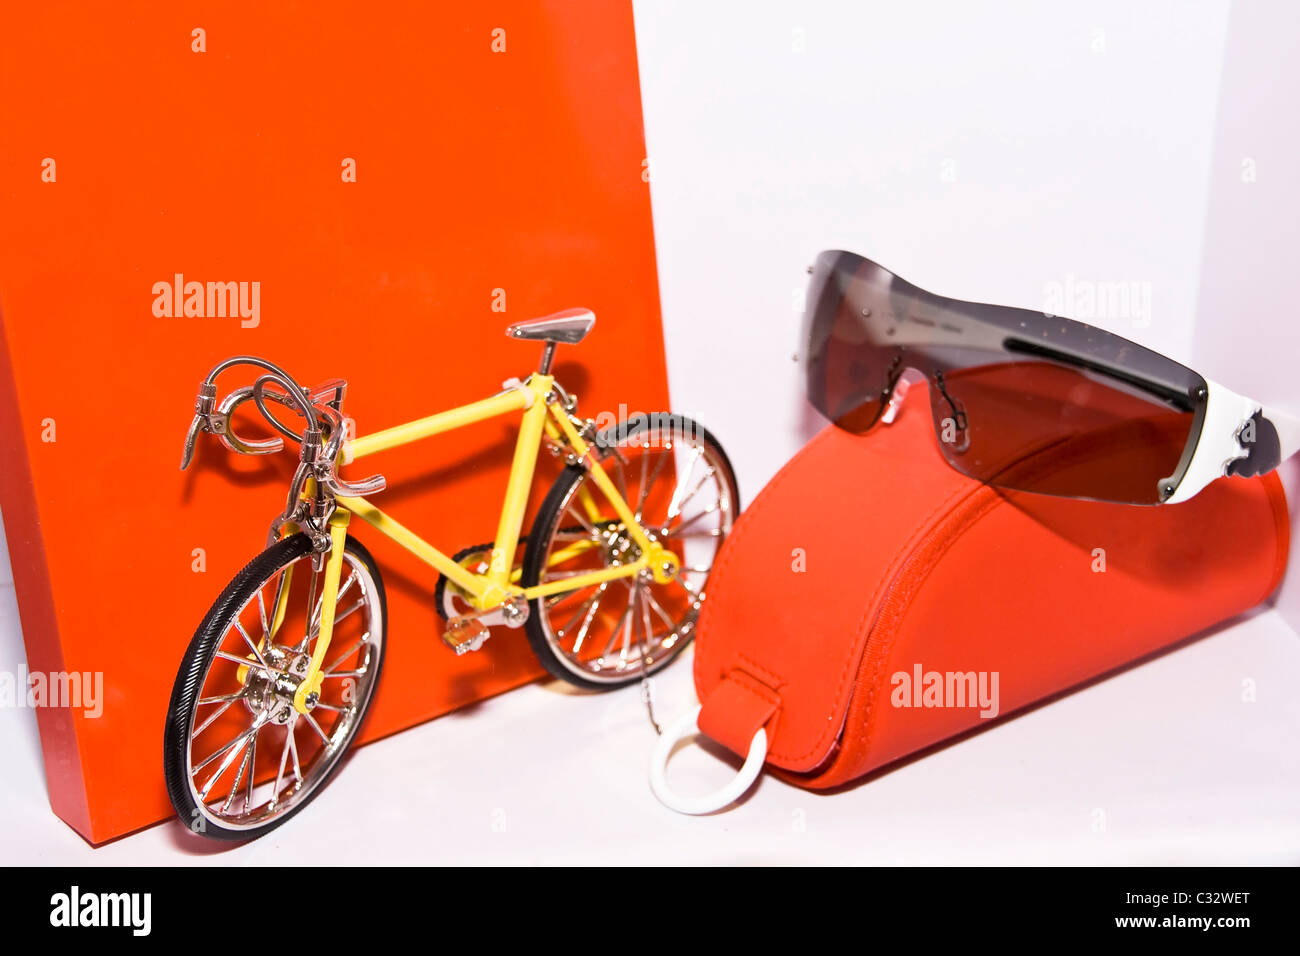 Eyeglasses display - Model Bicycles And Eyeglasses Display At The Shop